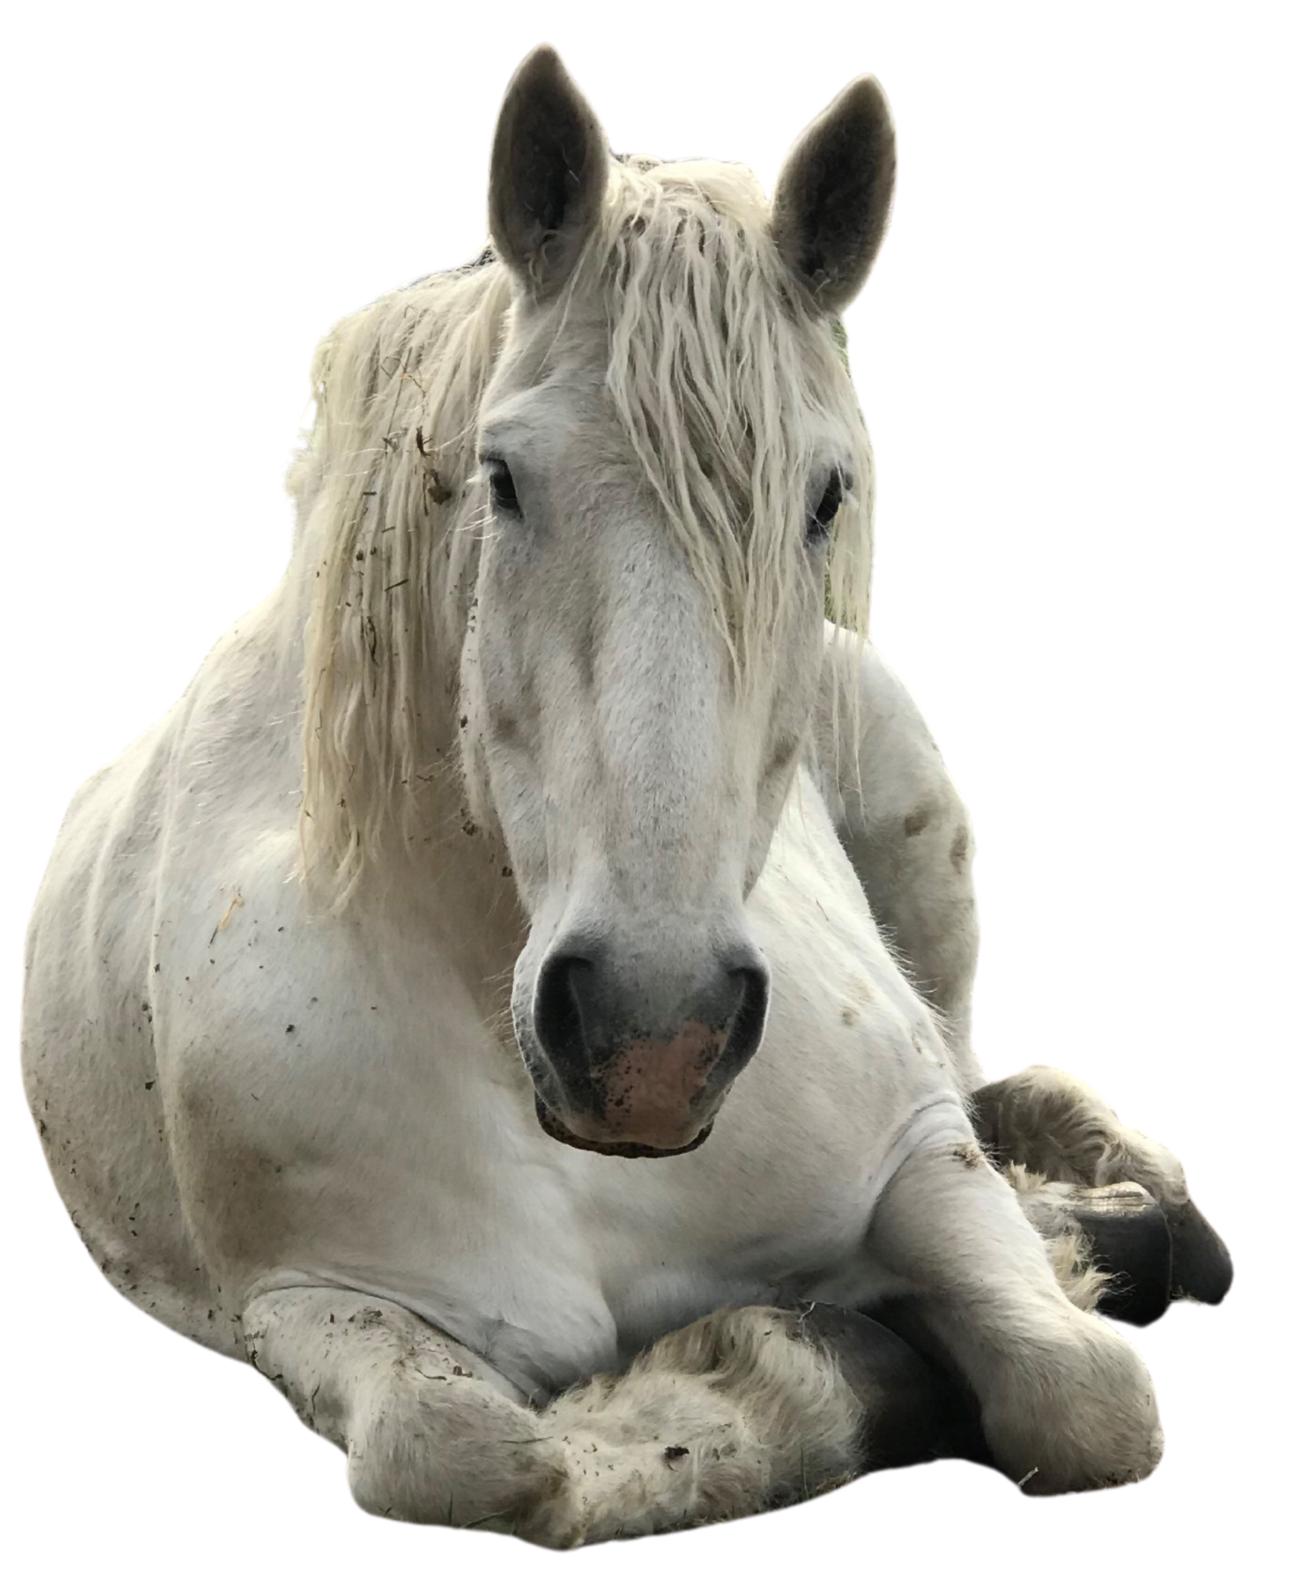 Boo, Achieve Equine Staff